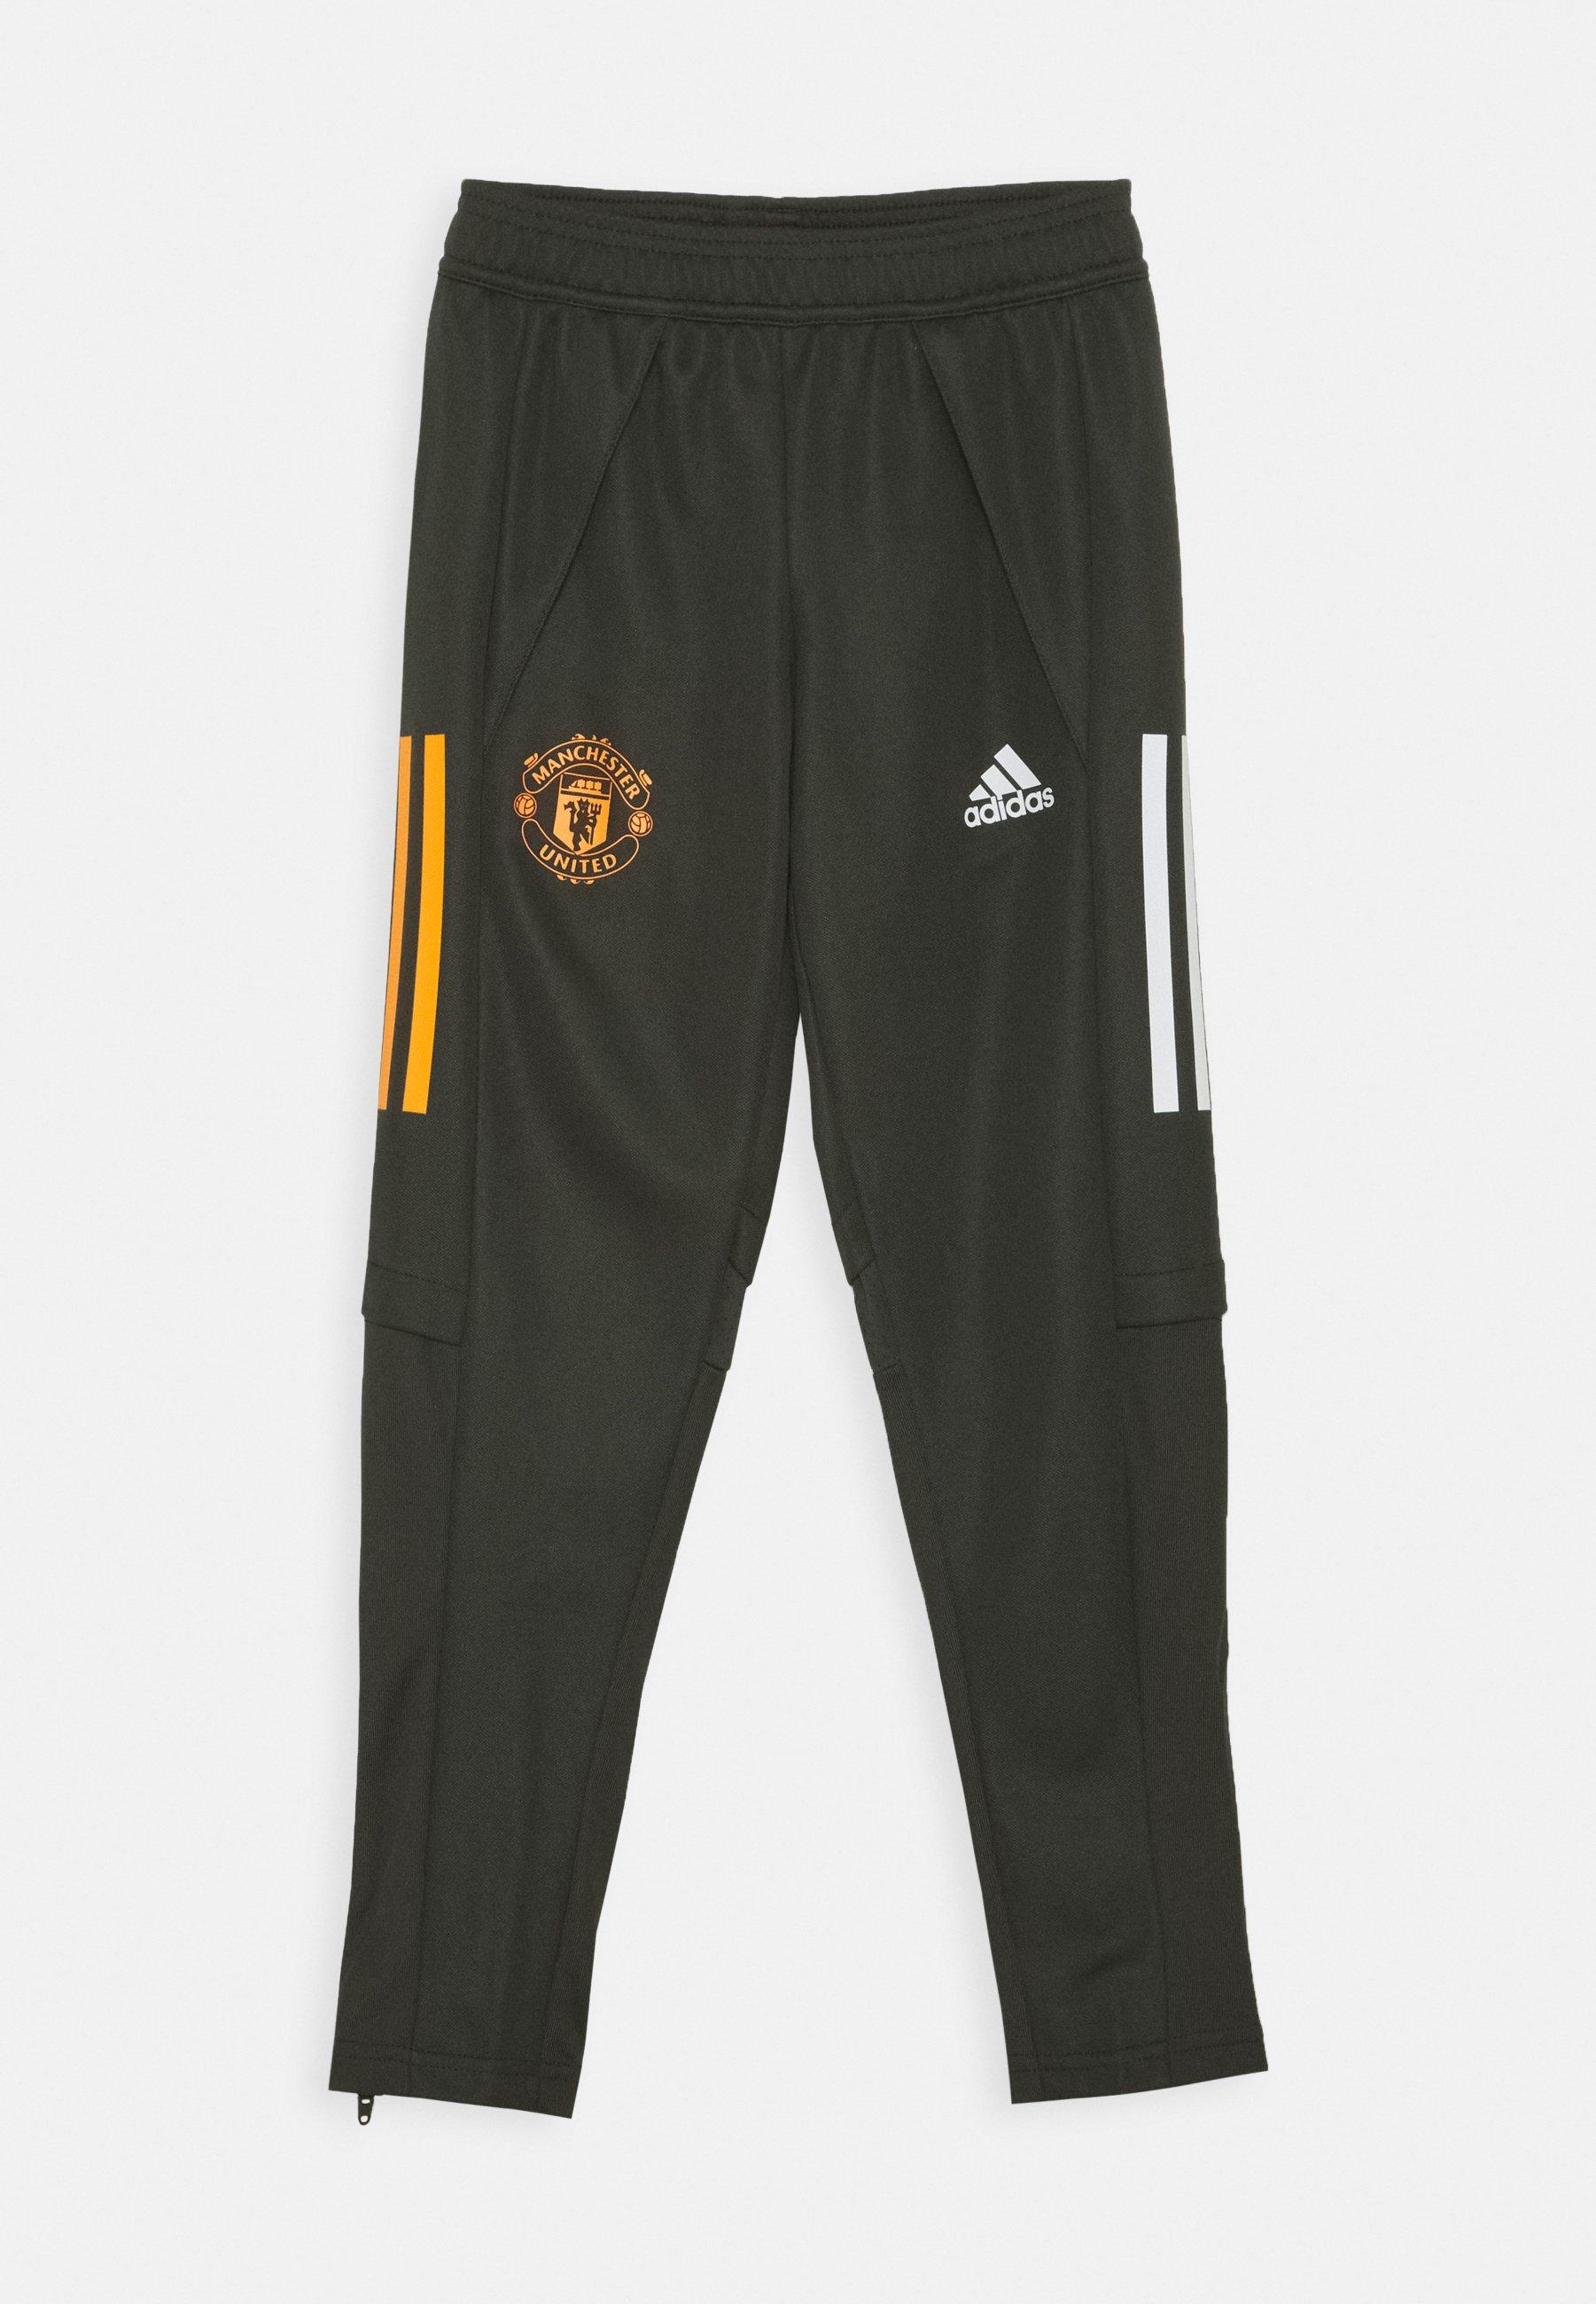 Kids MANCHESTER UNITED AEROREADY FOOTBALL PANTS - Club wear